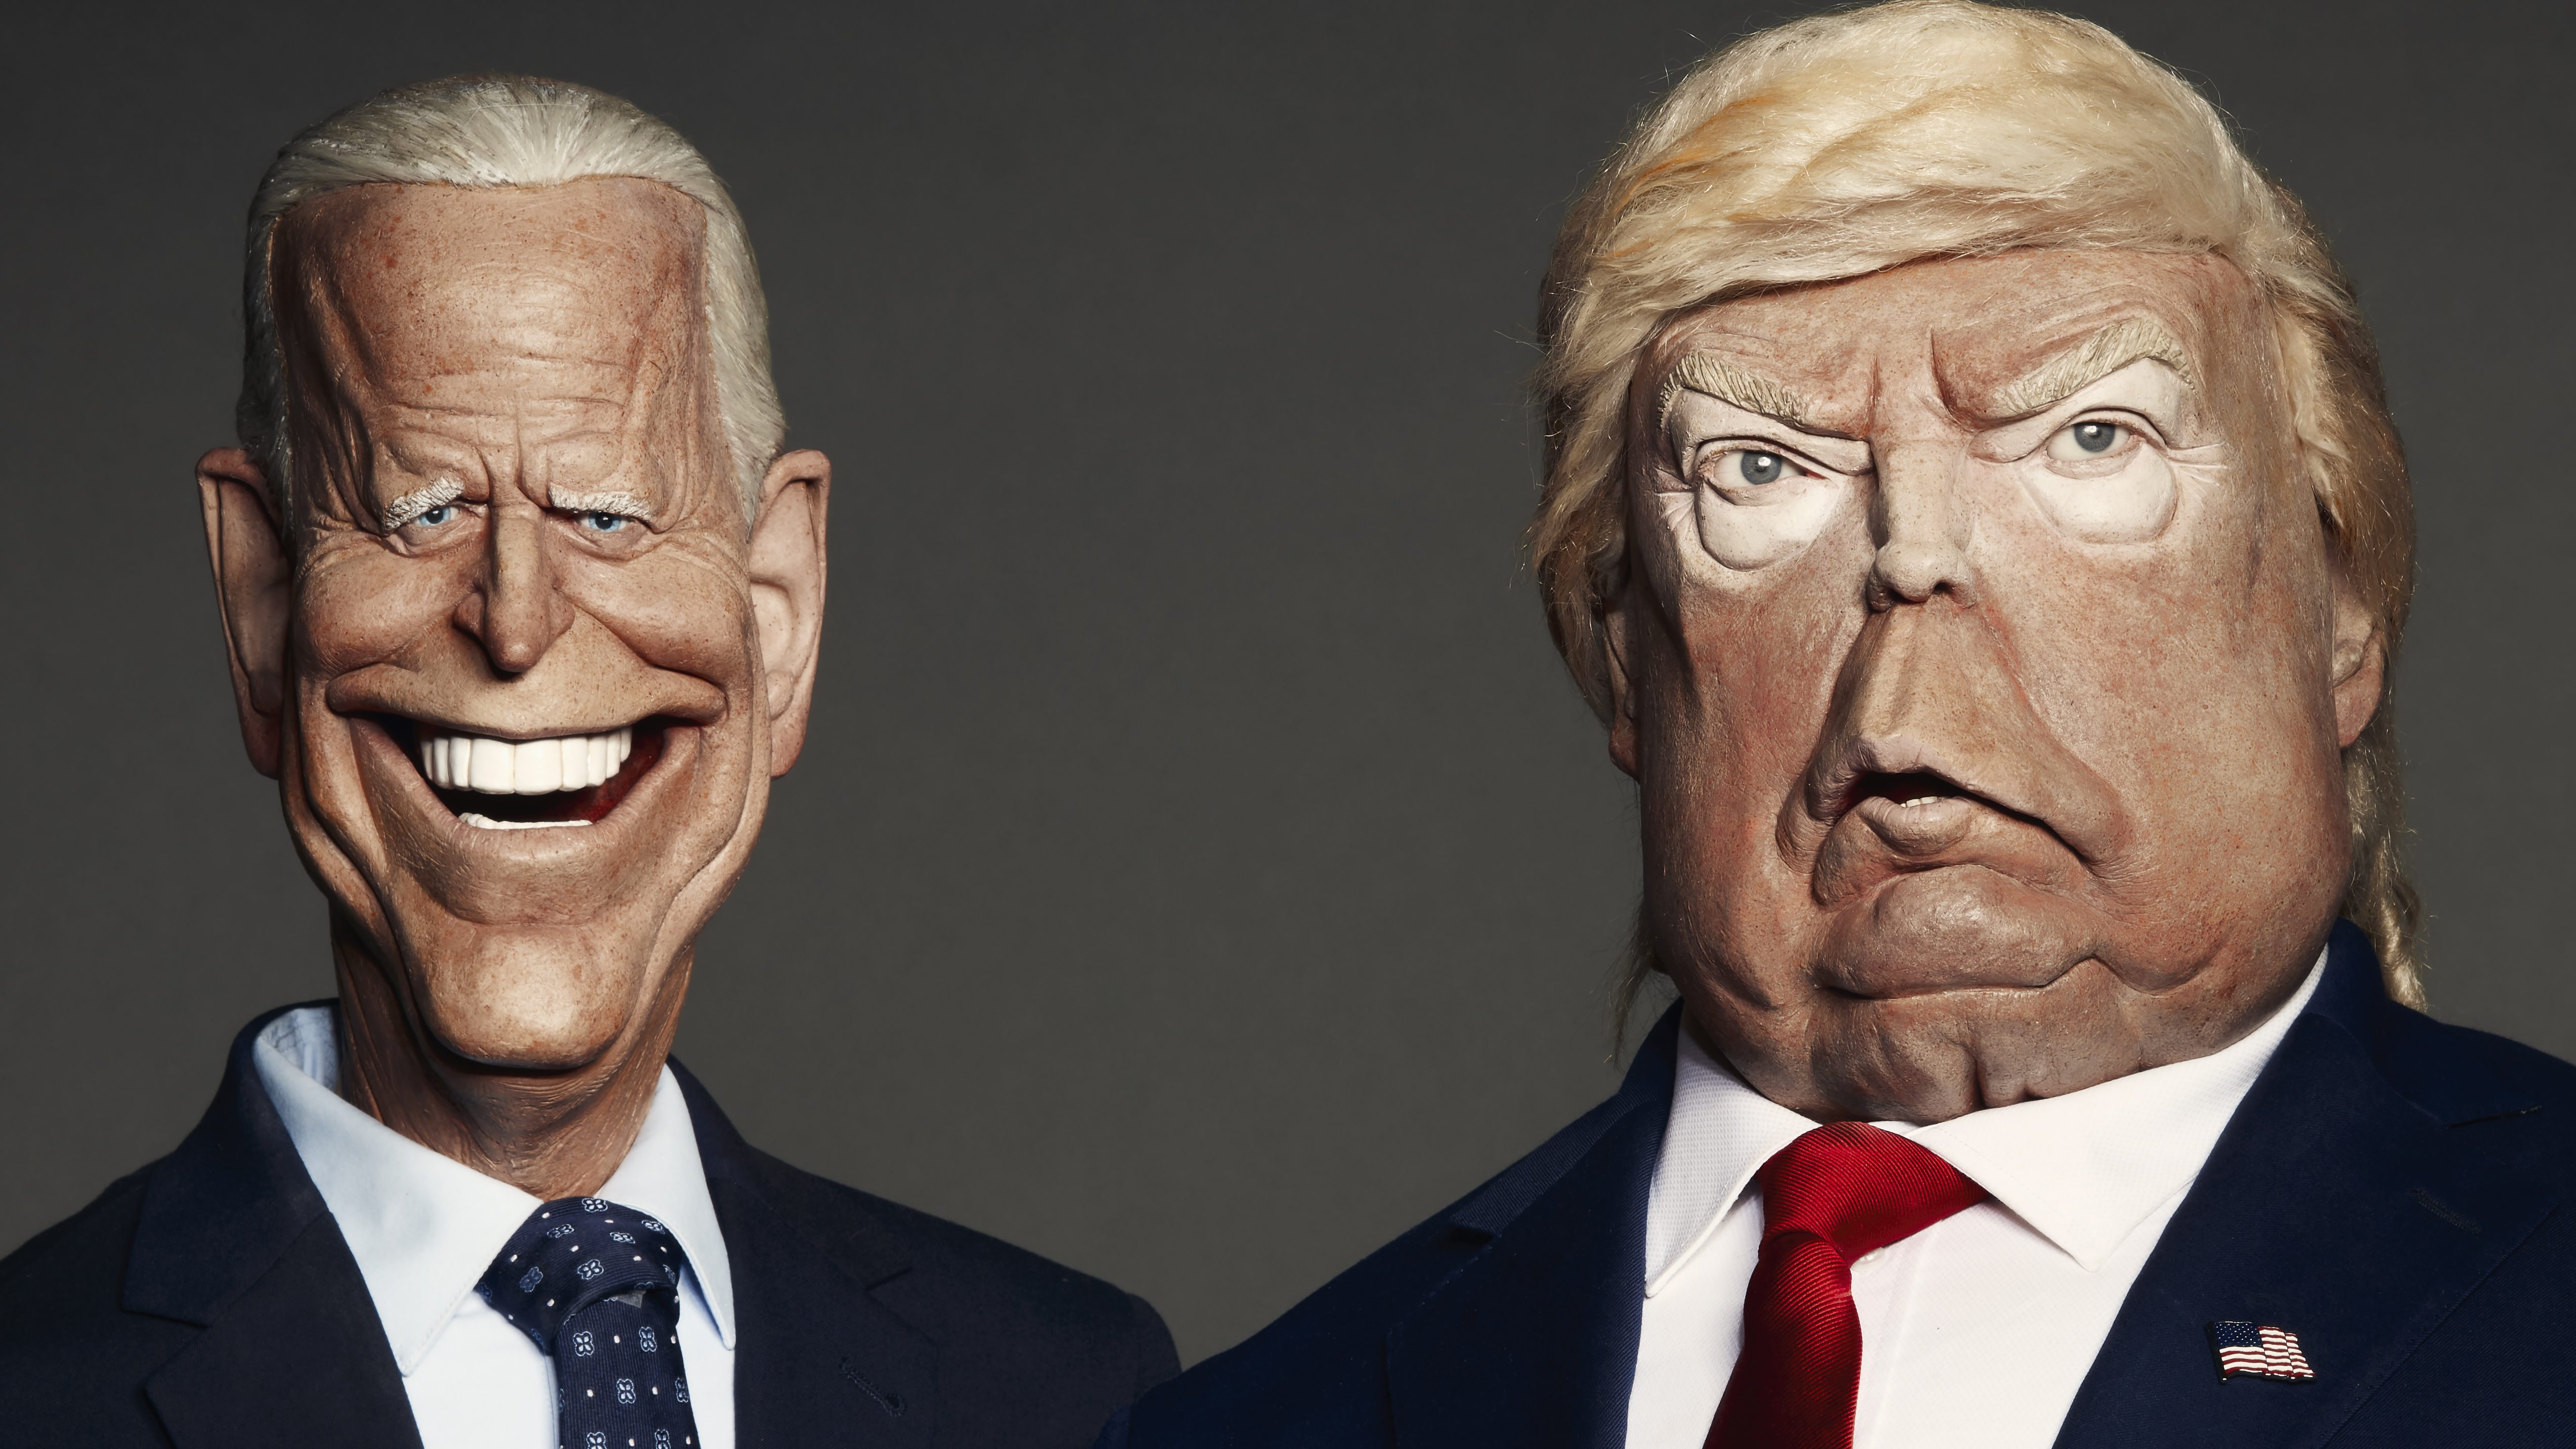 'Spitting Image' Plans U.S. Election Specials; ITV Orders 'Yorkshire Ripper' Series; Fremantle Promotes Seb Shorr — Global TV Briefs